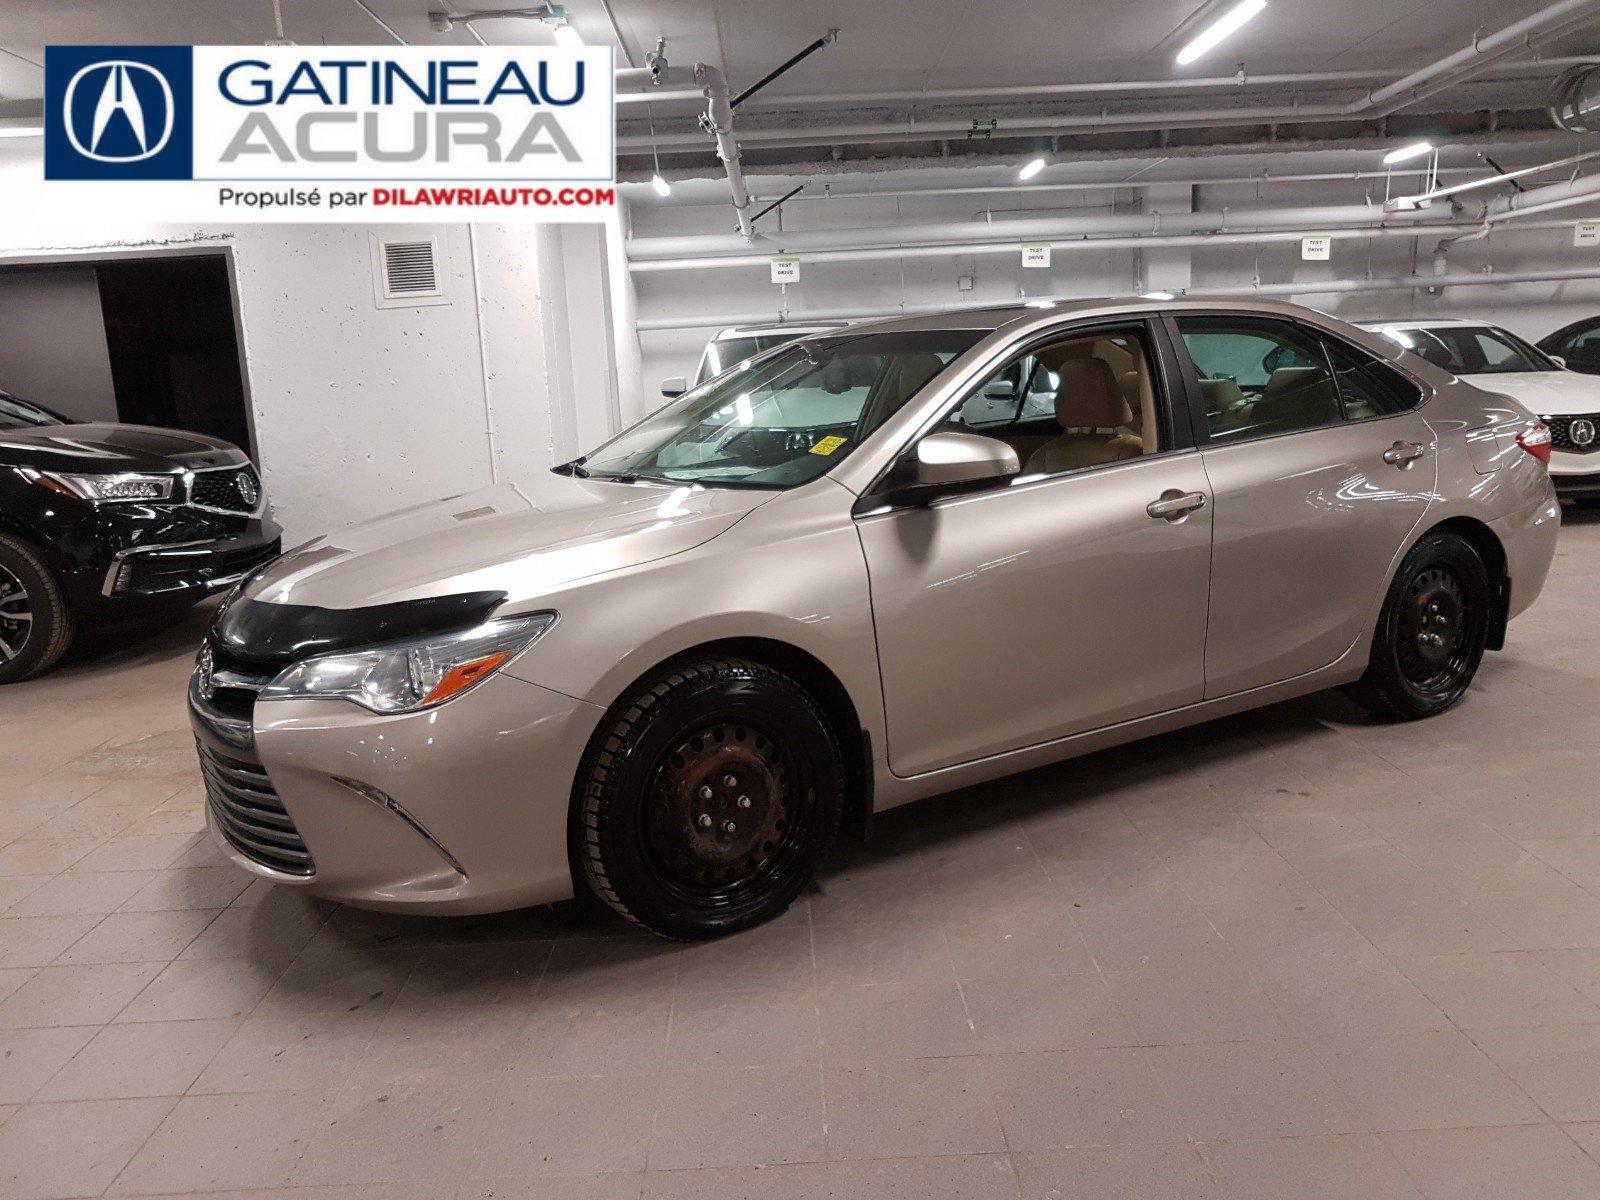 Toyota Camry 4dr Car - 2015